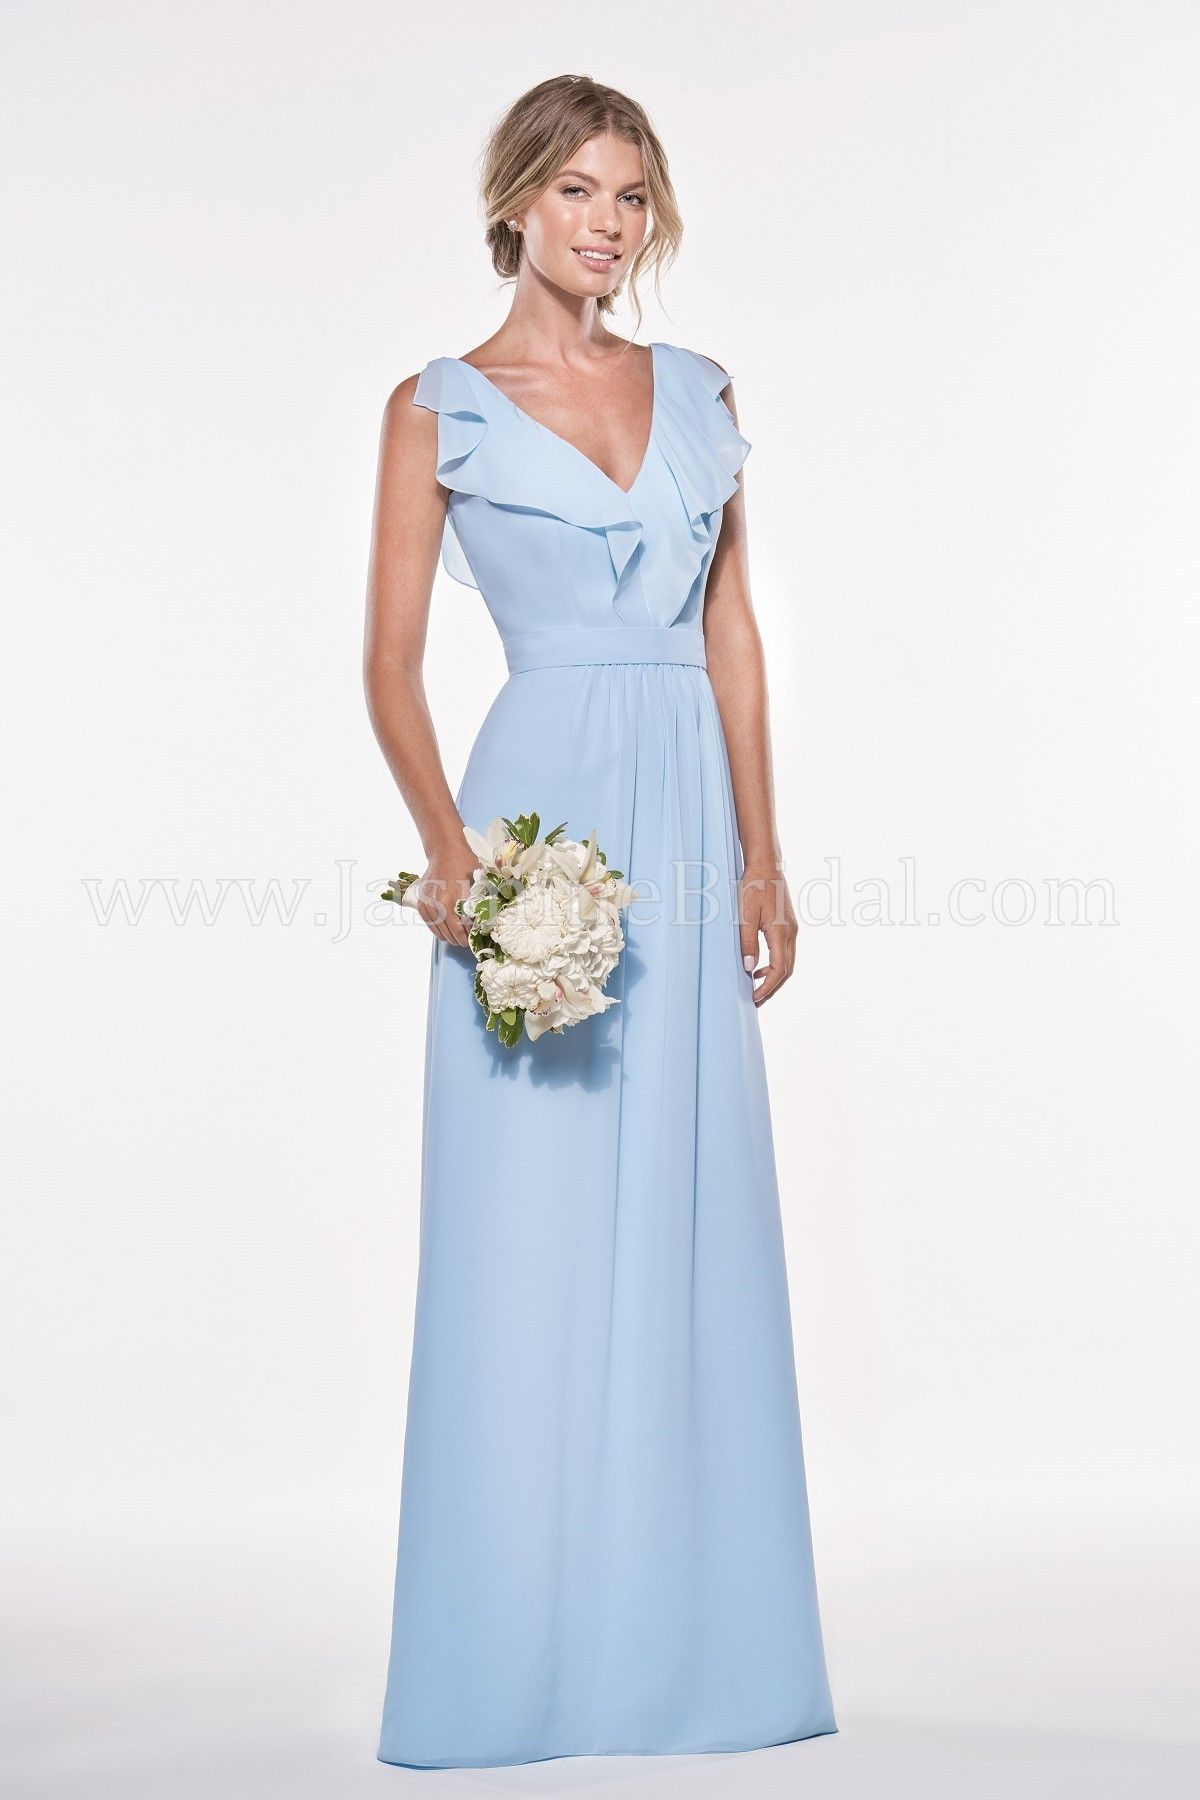 Jasmine bridal jasmine bridesmaids style p196007 in powder blue jasmine bridal jasmine bridesmaids style p196007 in powder blue ombrellifo Gallery